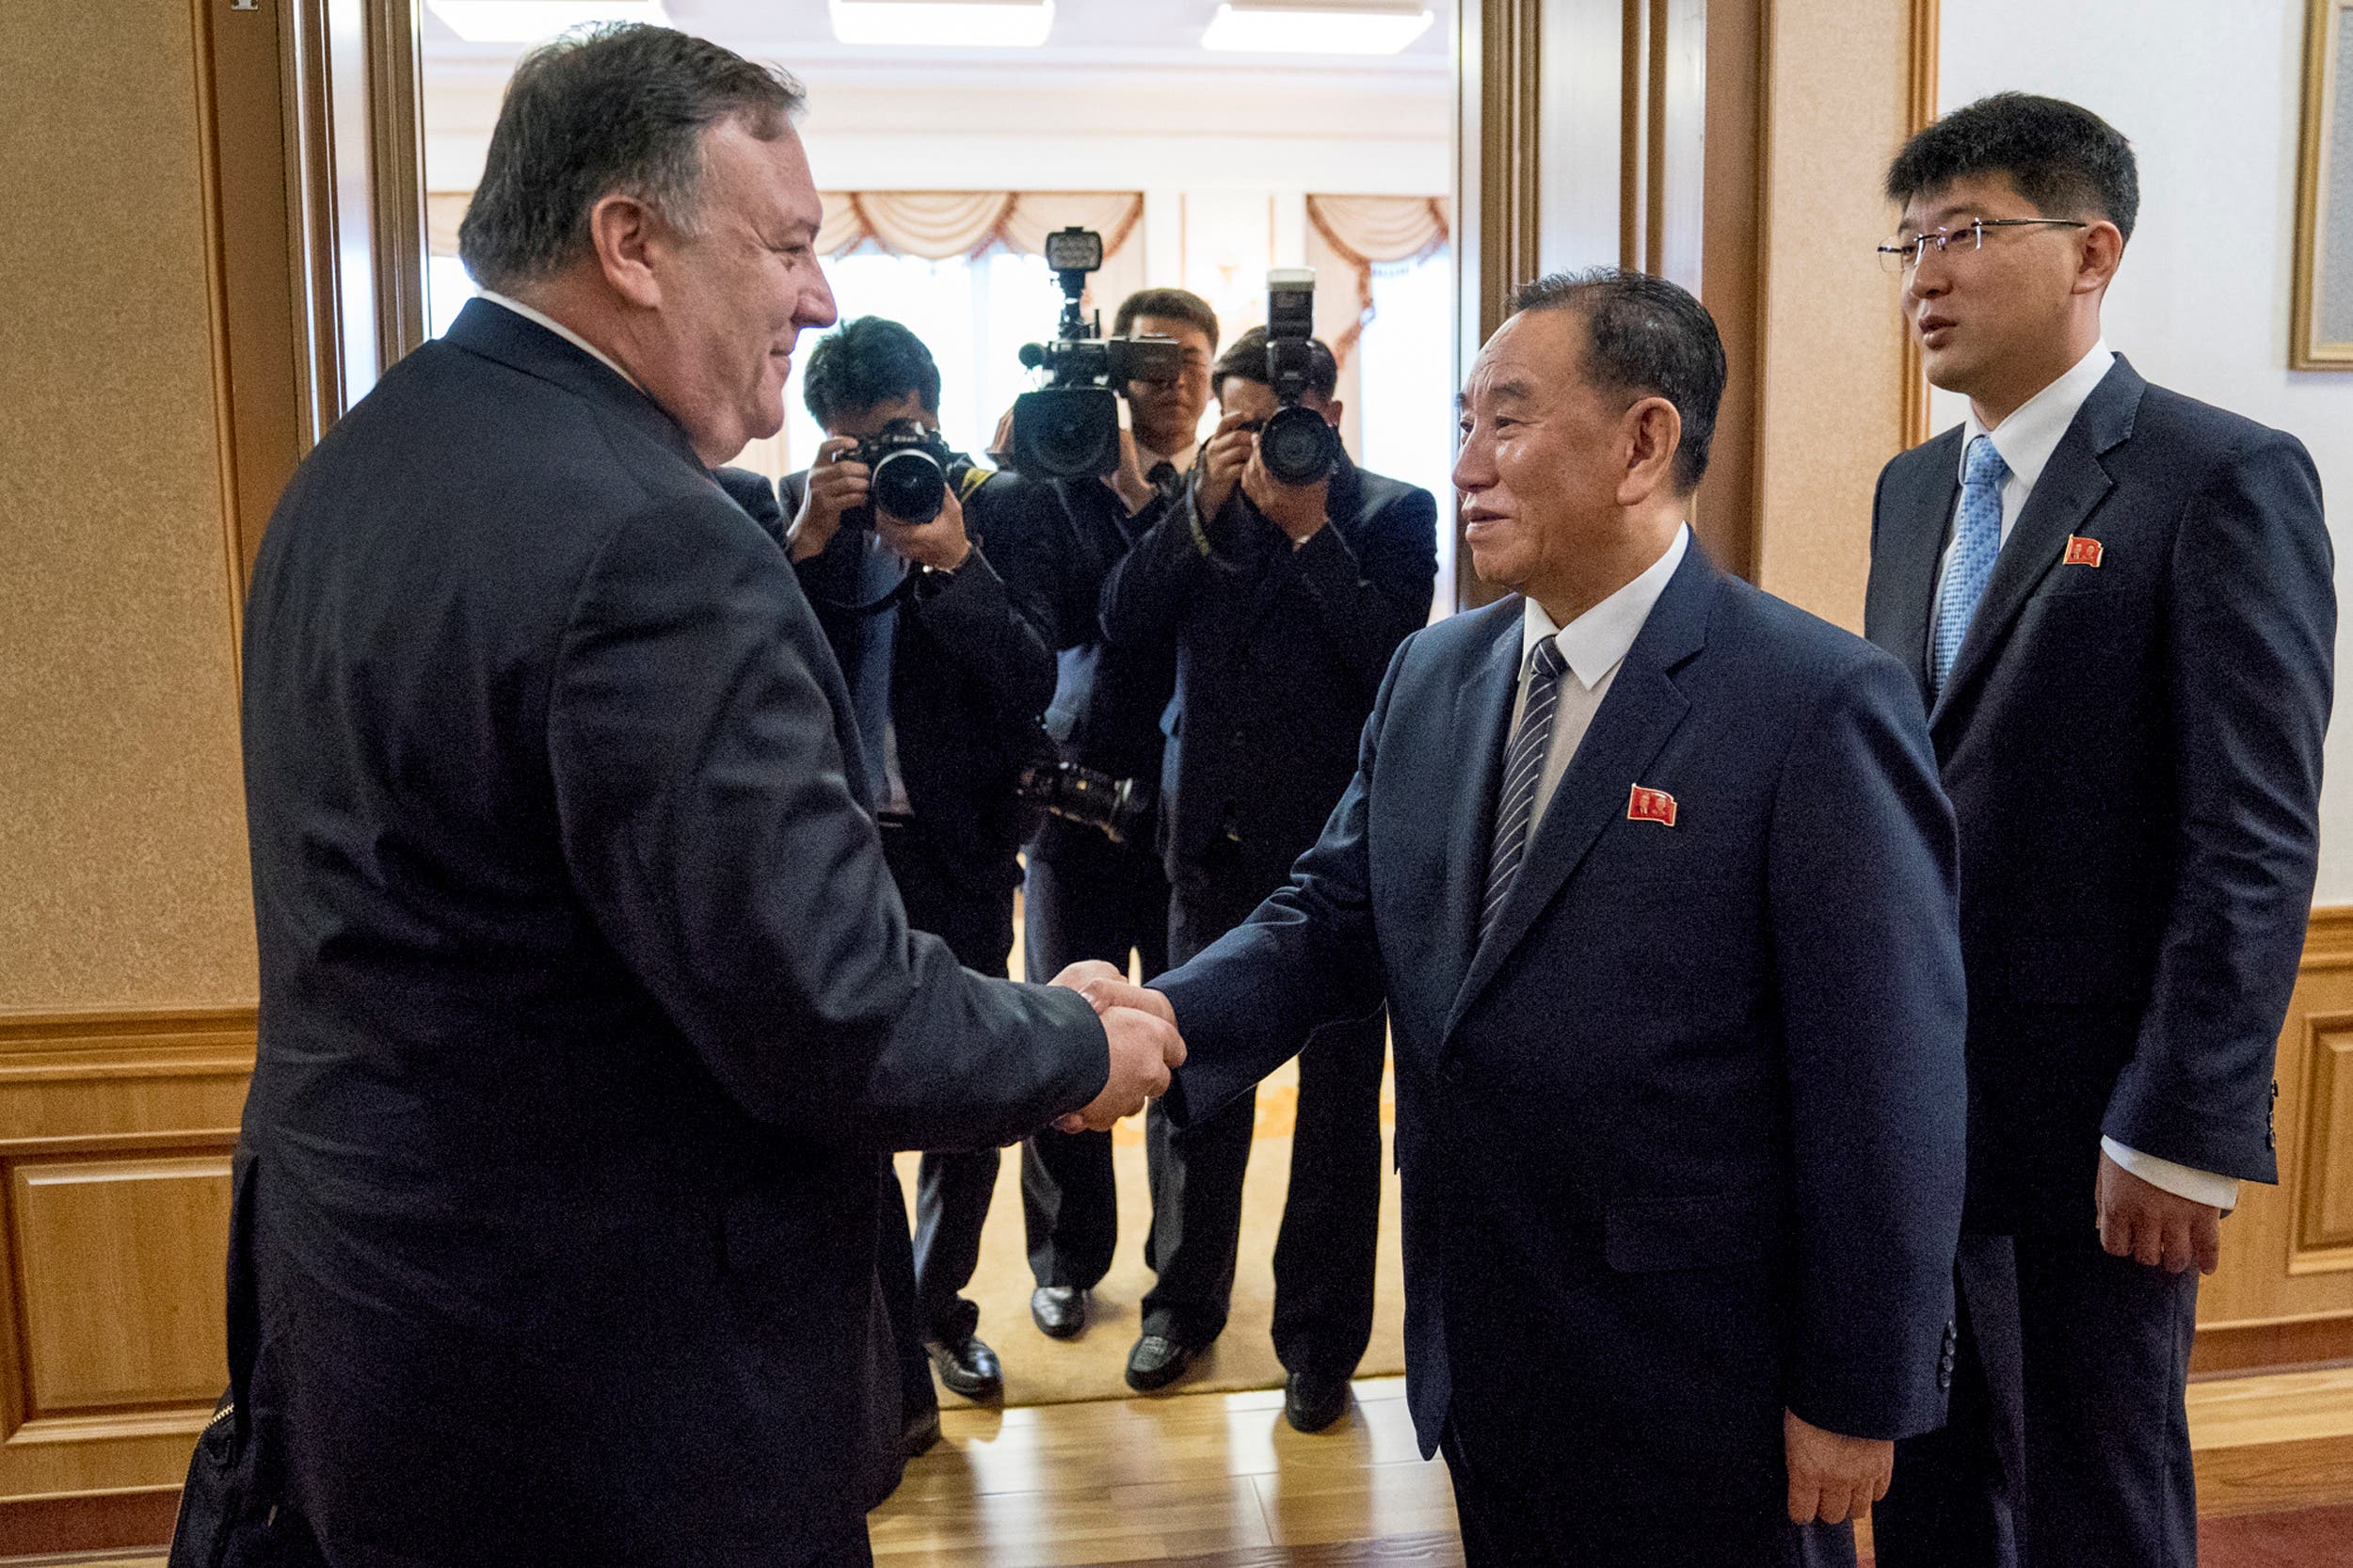 Pompeo N.Korea (Reuters)